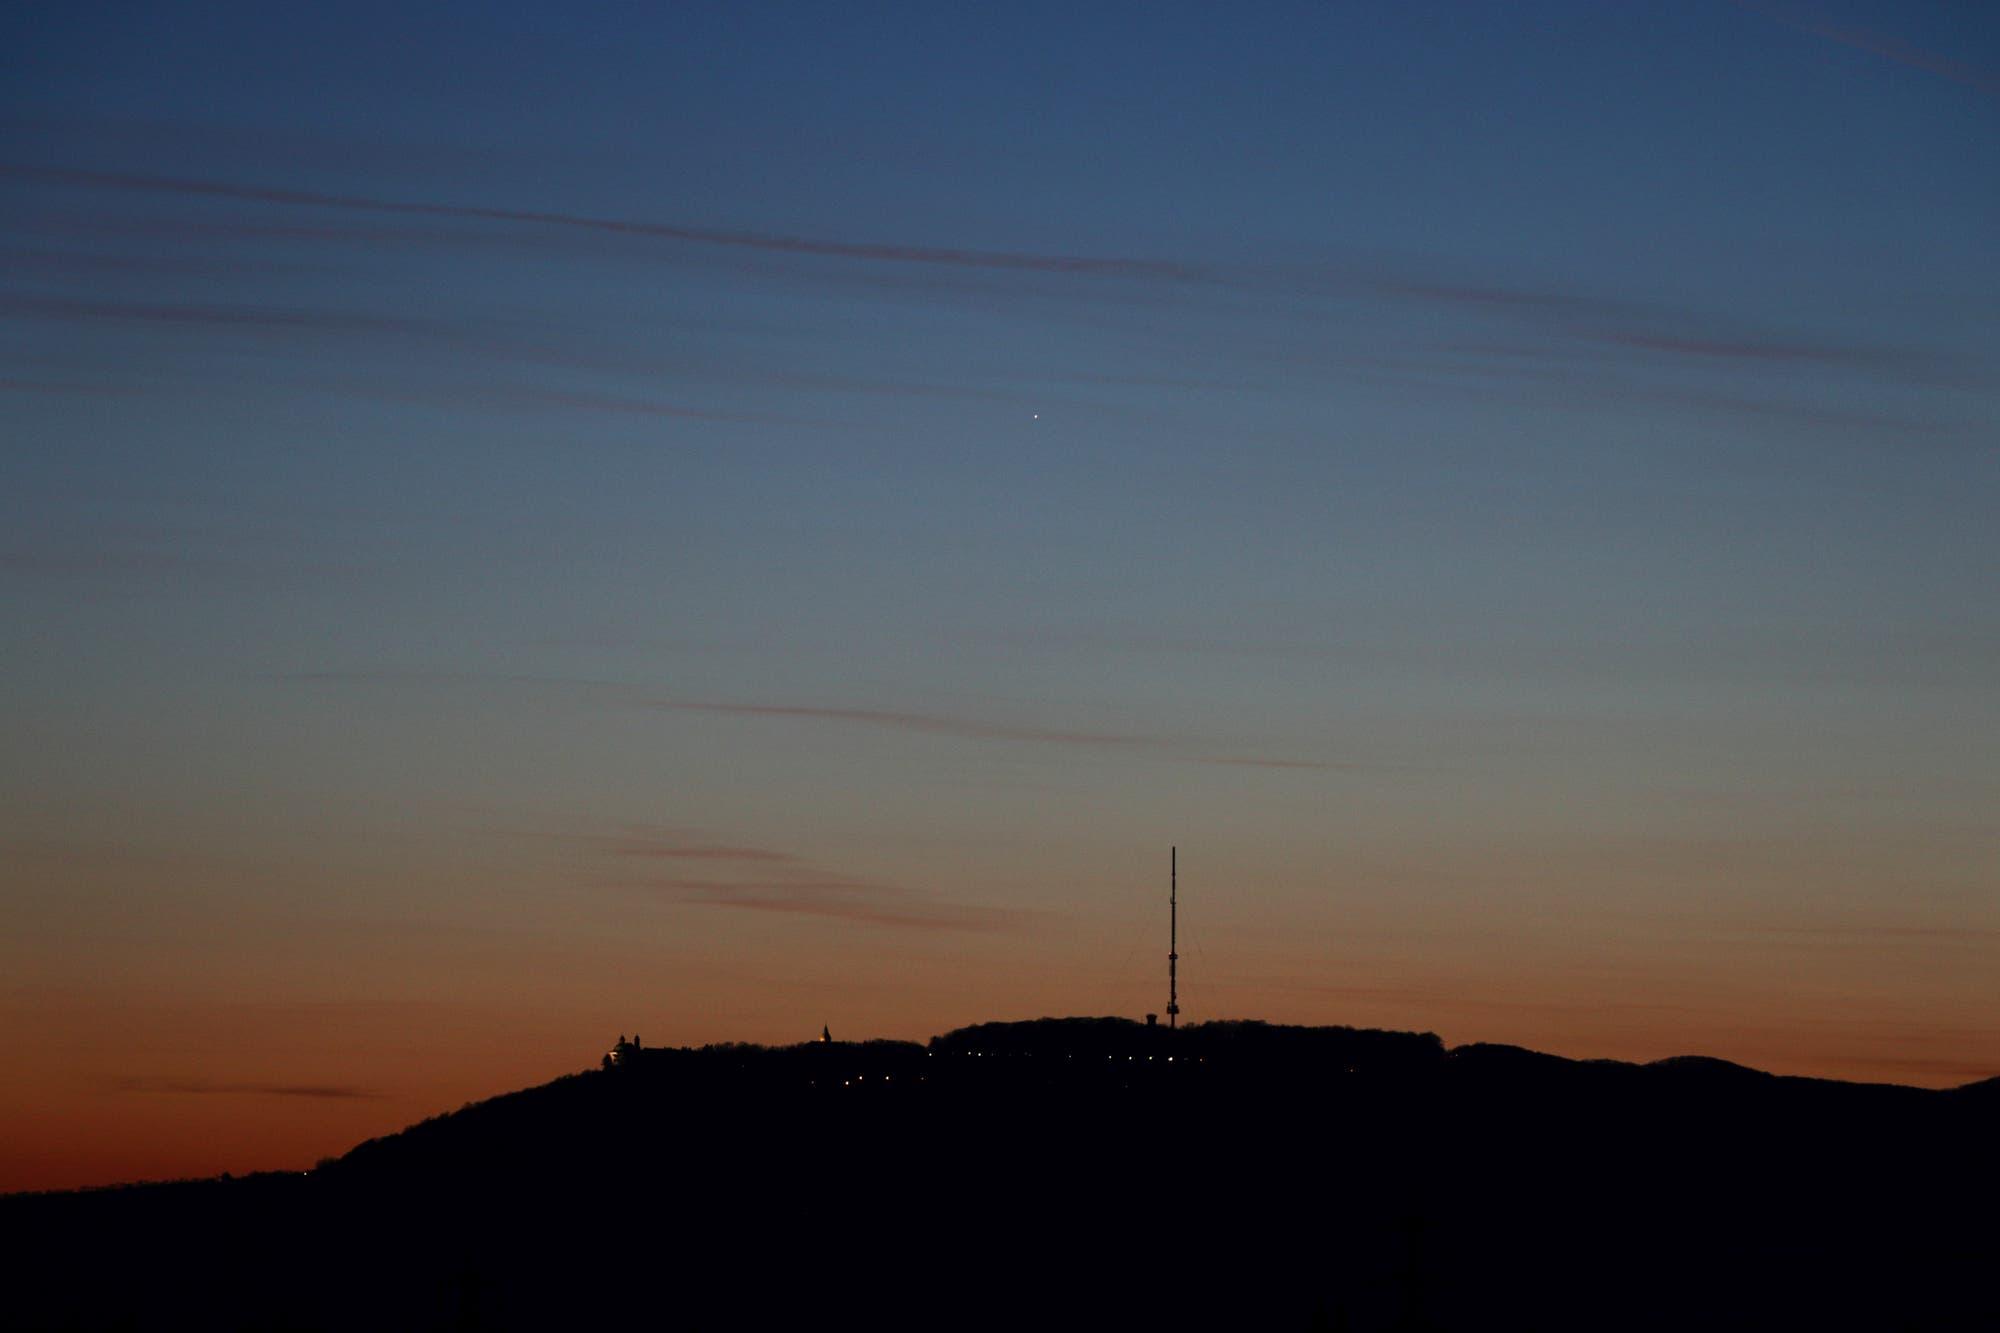 Merkur am Abendhimmel